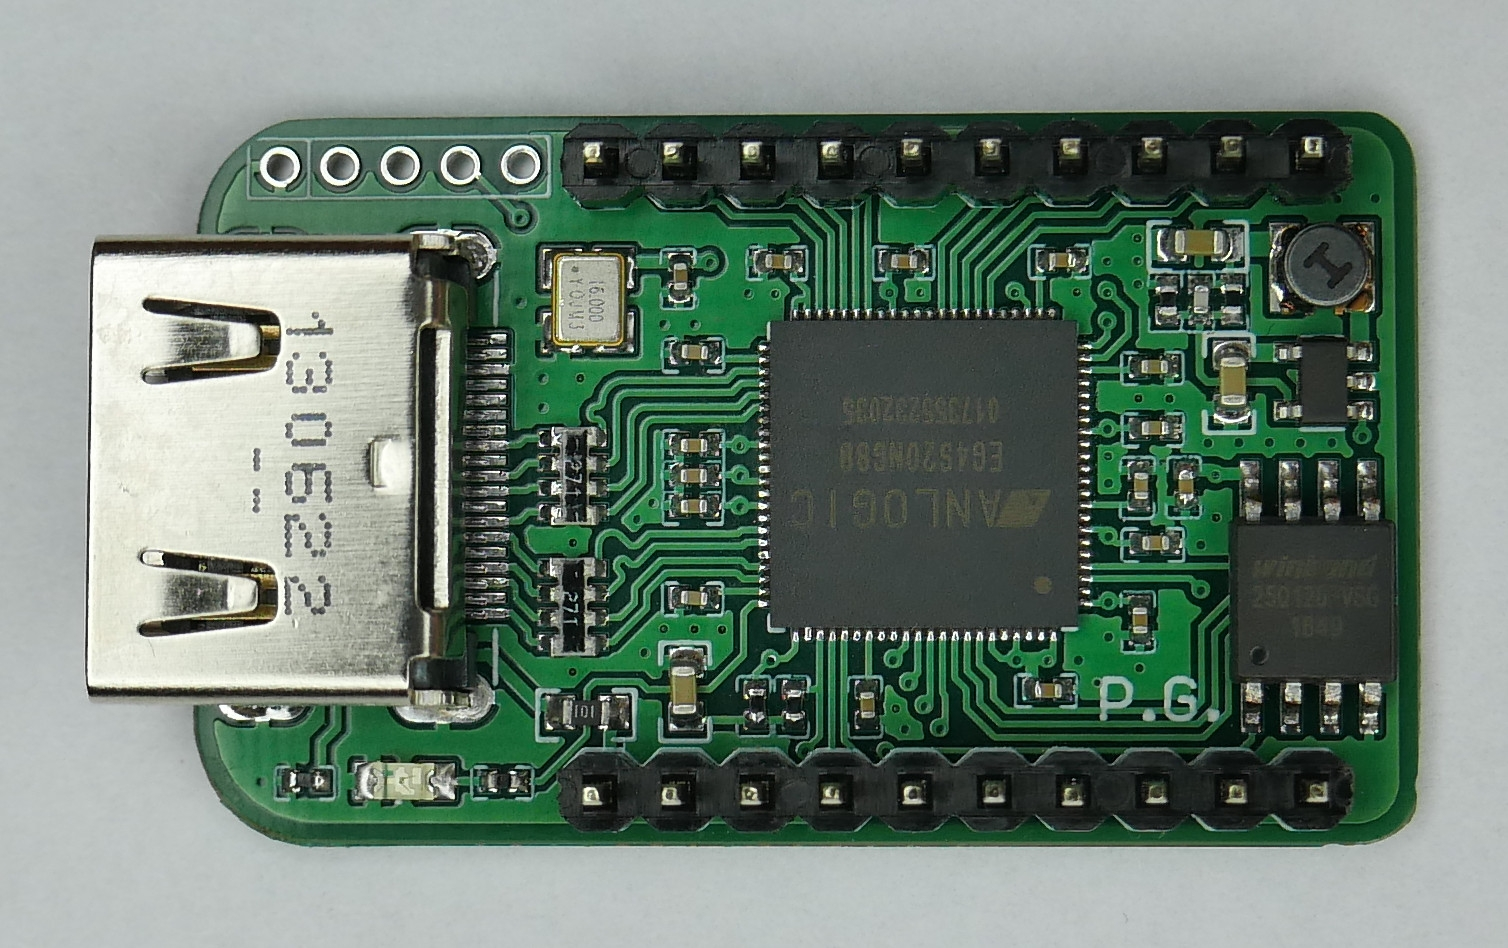 Pocket retro-emulator on Chinese FPGA by piotr_go